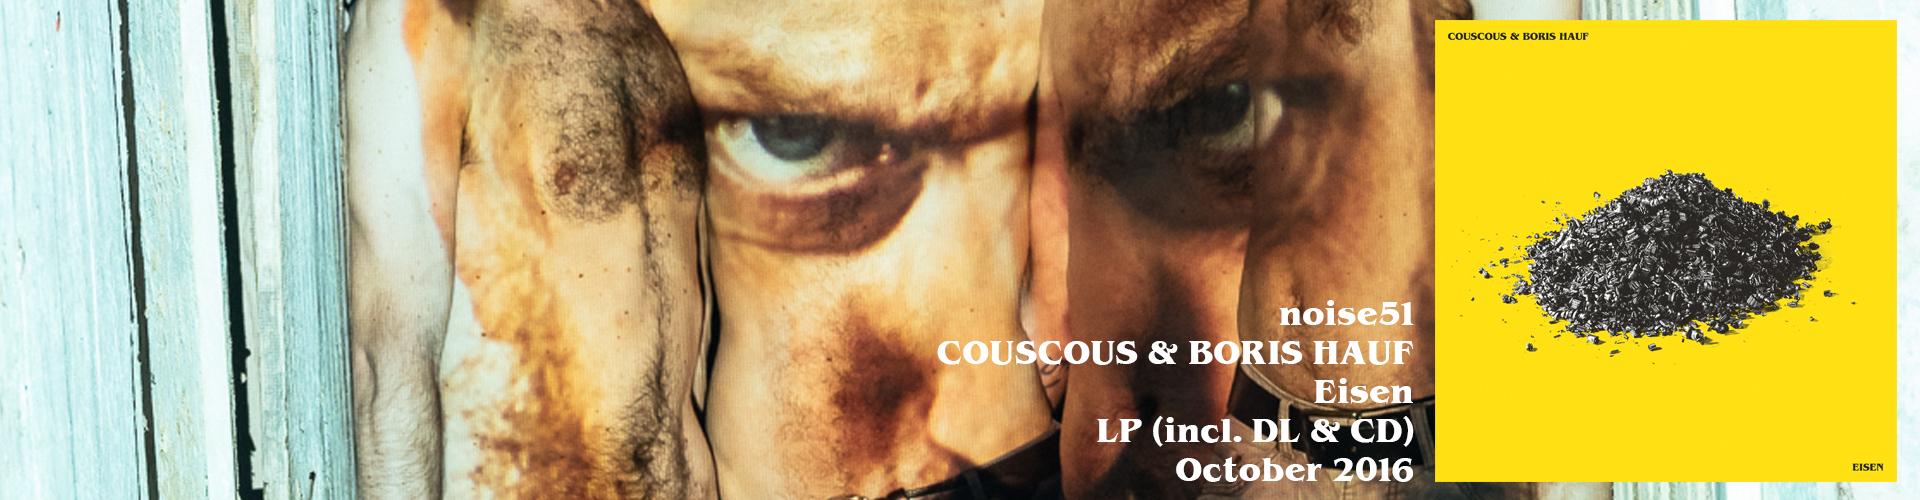 coucous-noise46.jpg